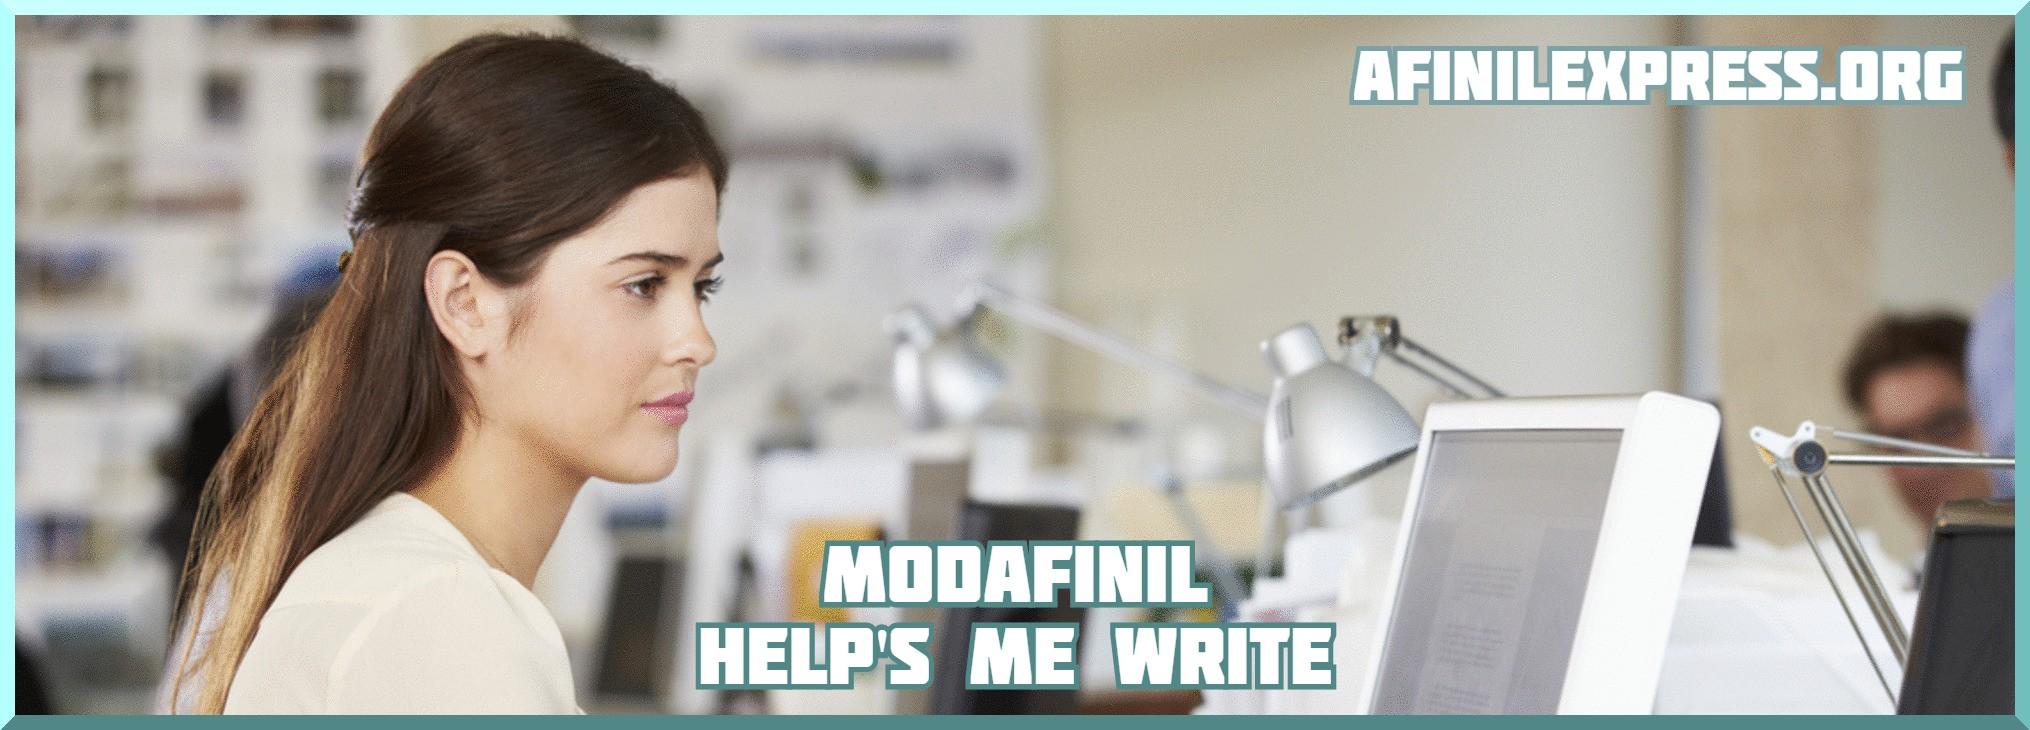 Modafinil help's me write